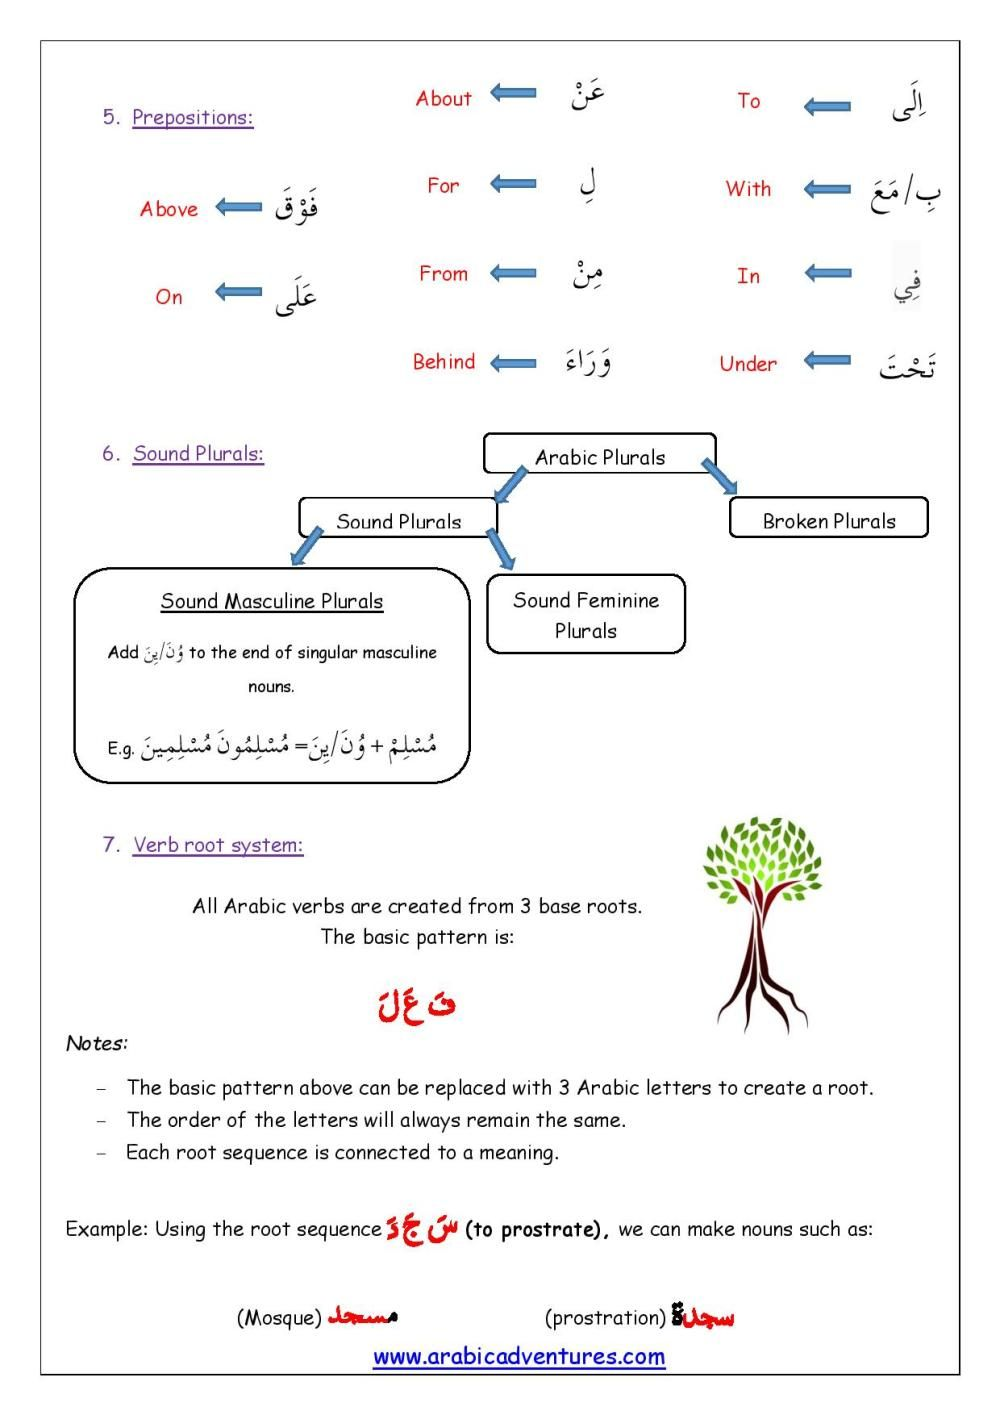 Back To Madrasah Arabic Grammar Revision Sheet Arabic Adventures Learning Arabic Arabic Verbs English Worksheets For Kids [ 1415 x 1000 Pixel ]